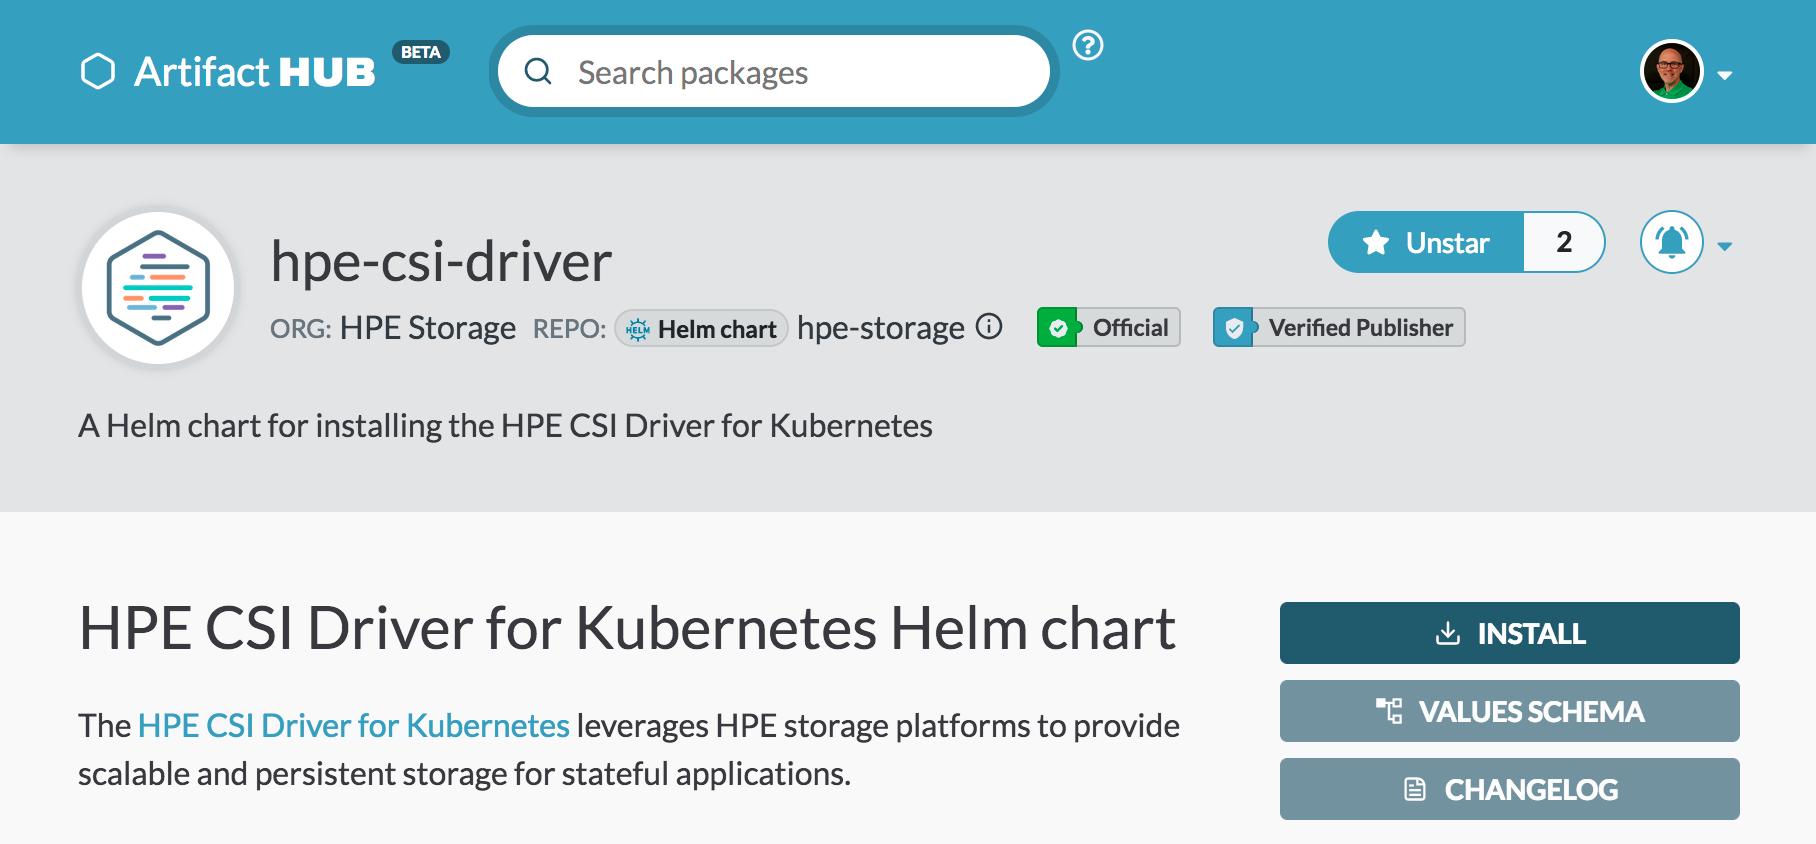 HPE CSI Driver for Kubernetes Helm chart